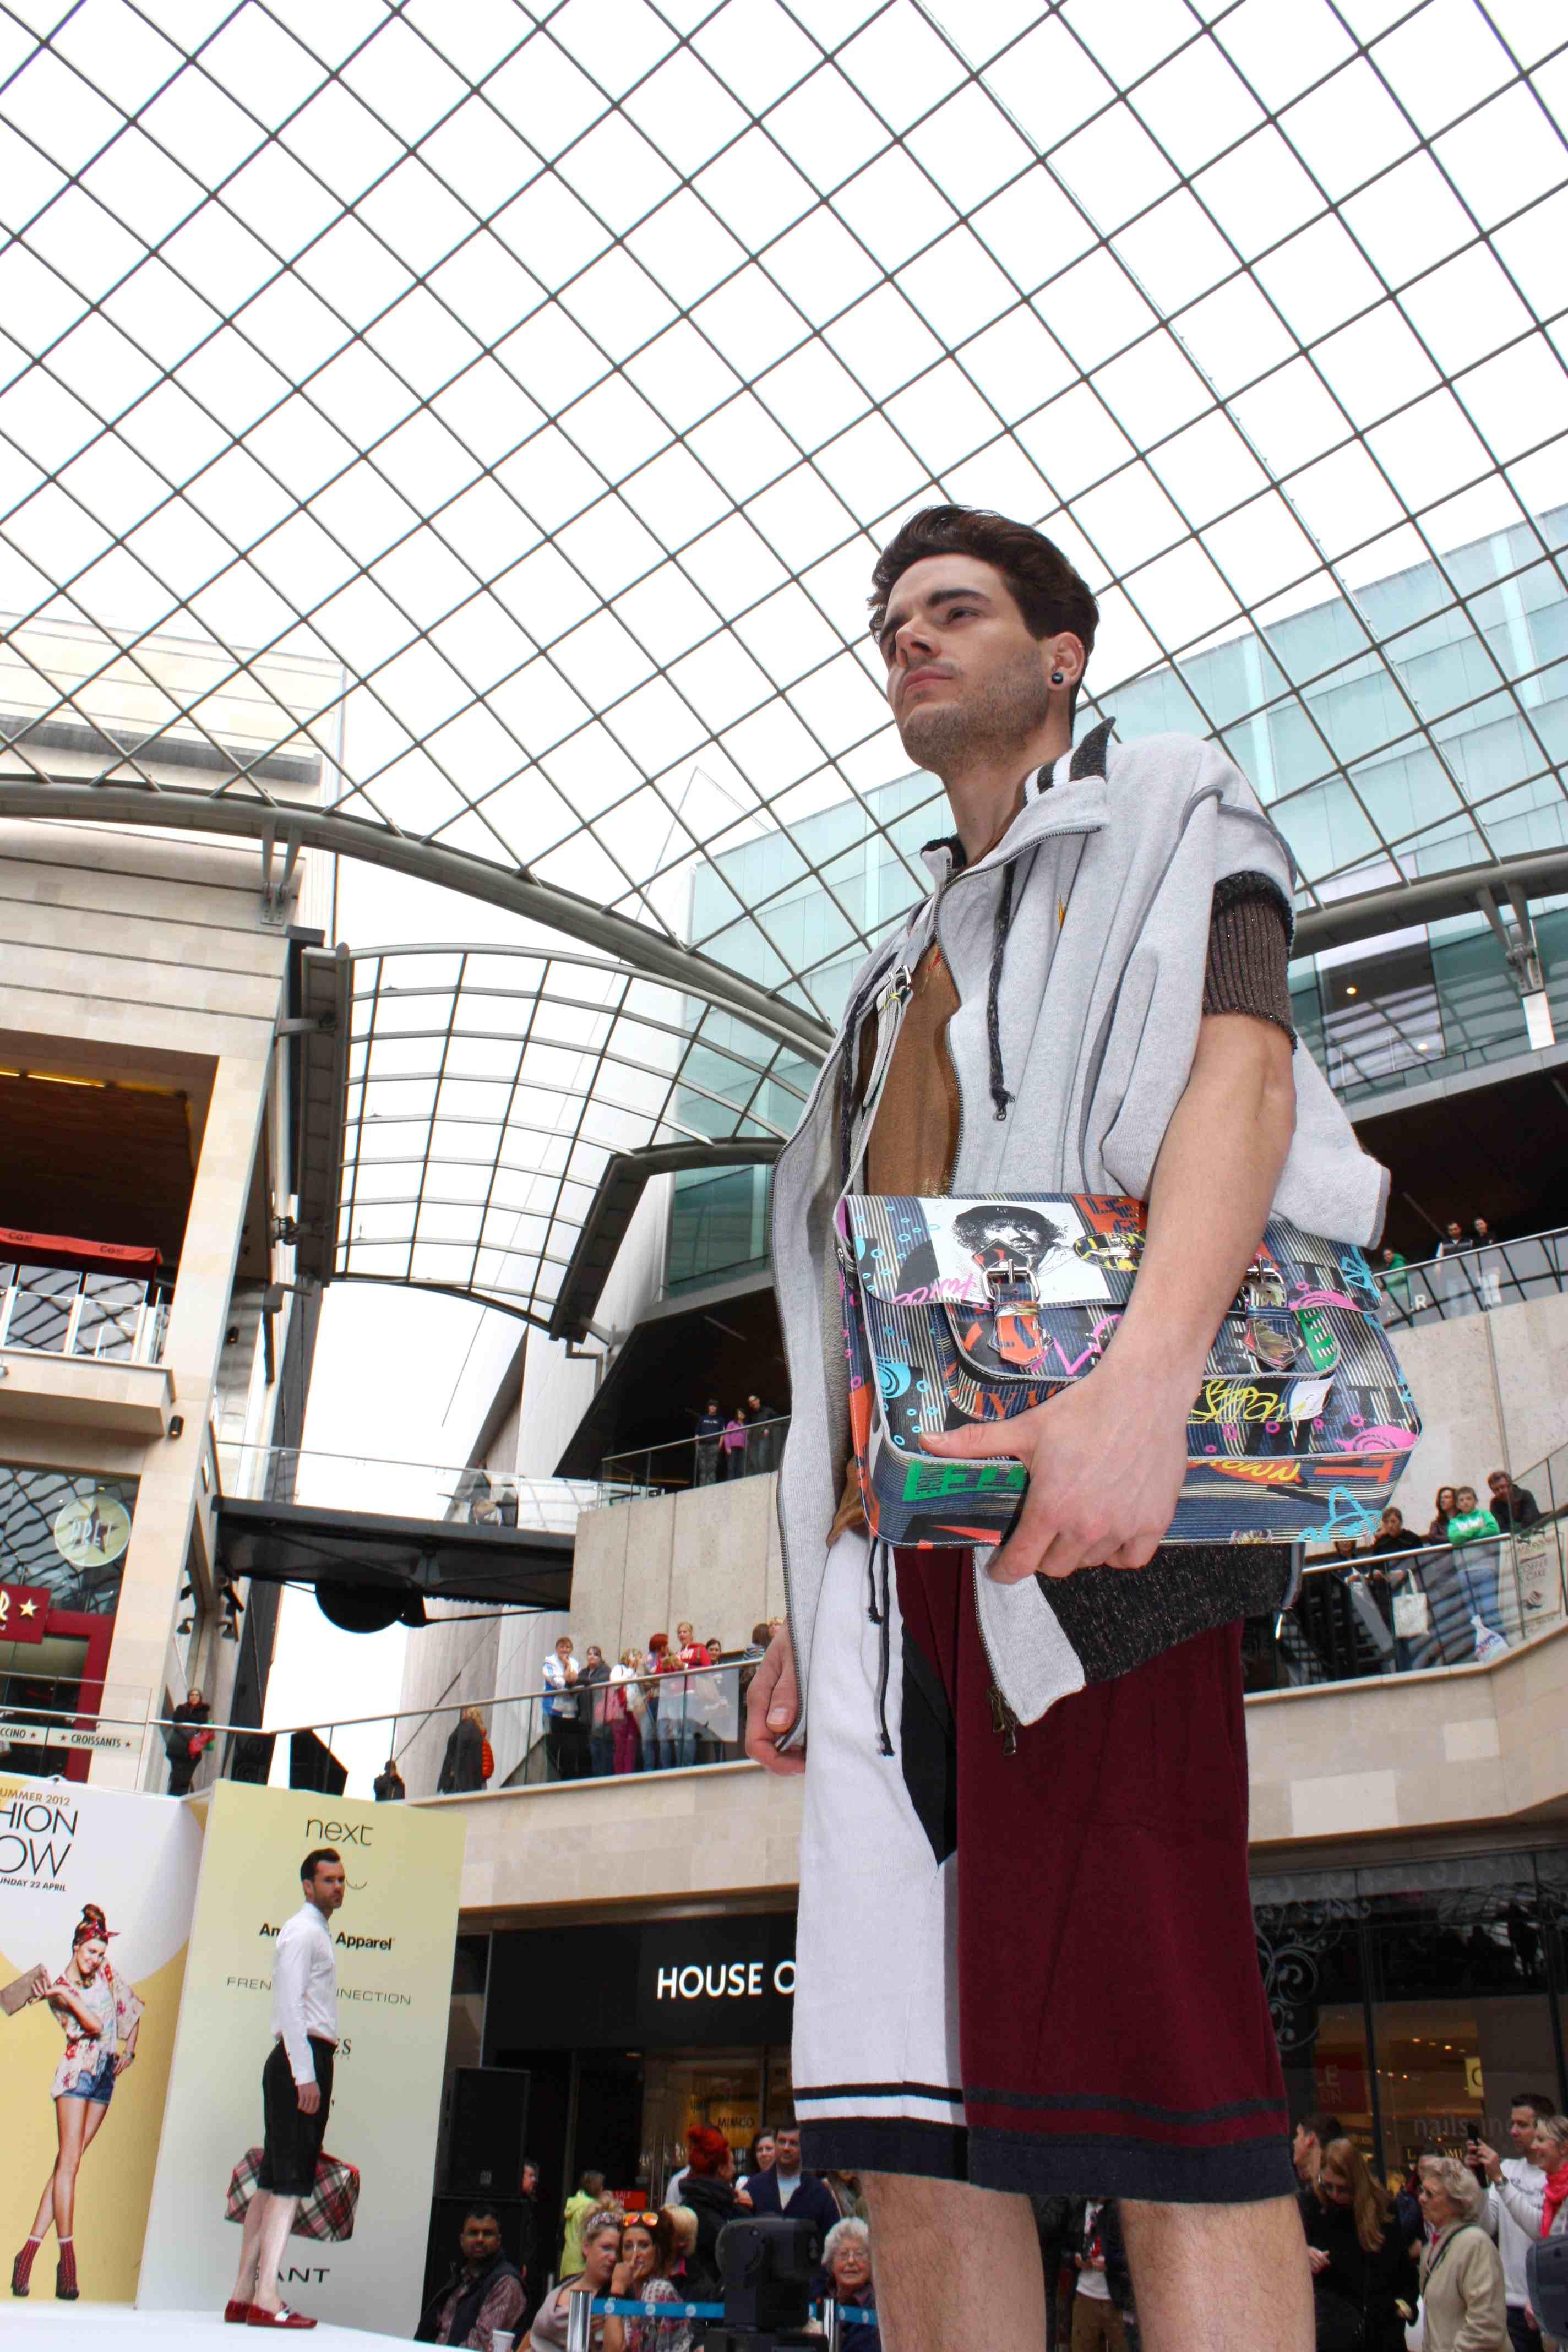 garment quarter - Bristol Shopping Quarter